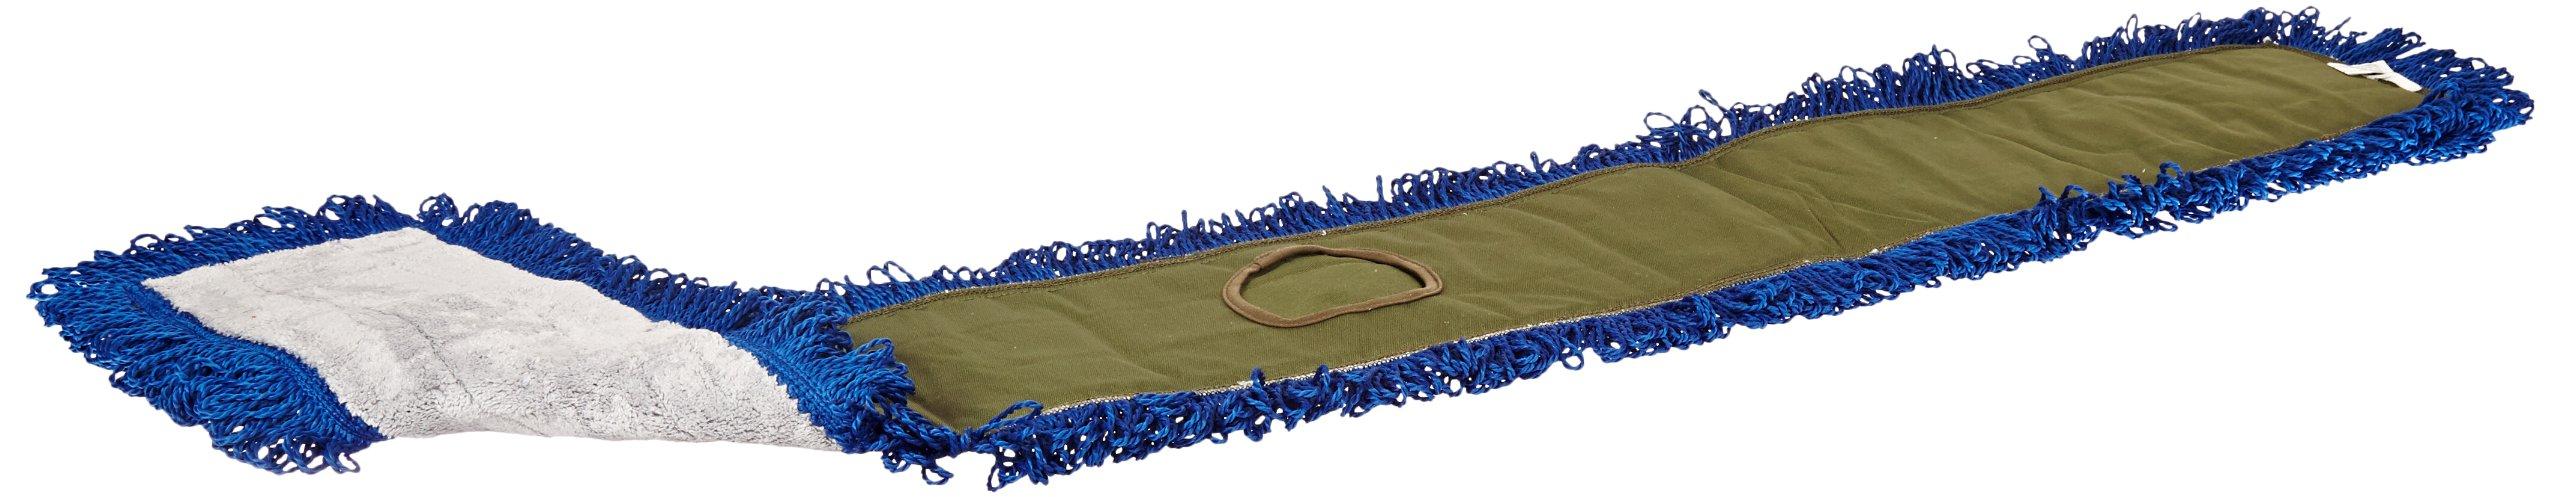 Impact LFCB60 Fringe Dry/Dust Mop Microfiber Pad, Canvas Back, 60'' Length, Gray/Gray (2 Bags of 12)